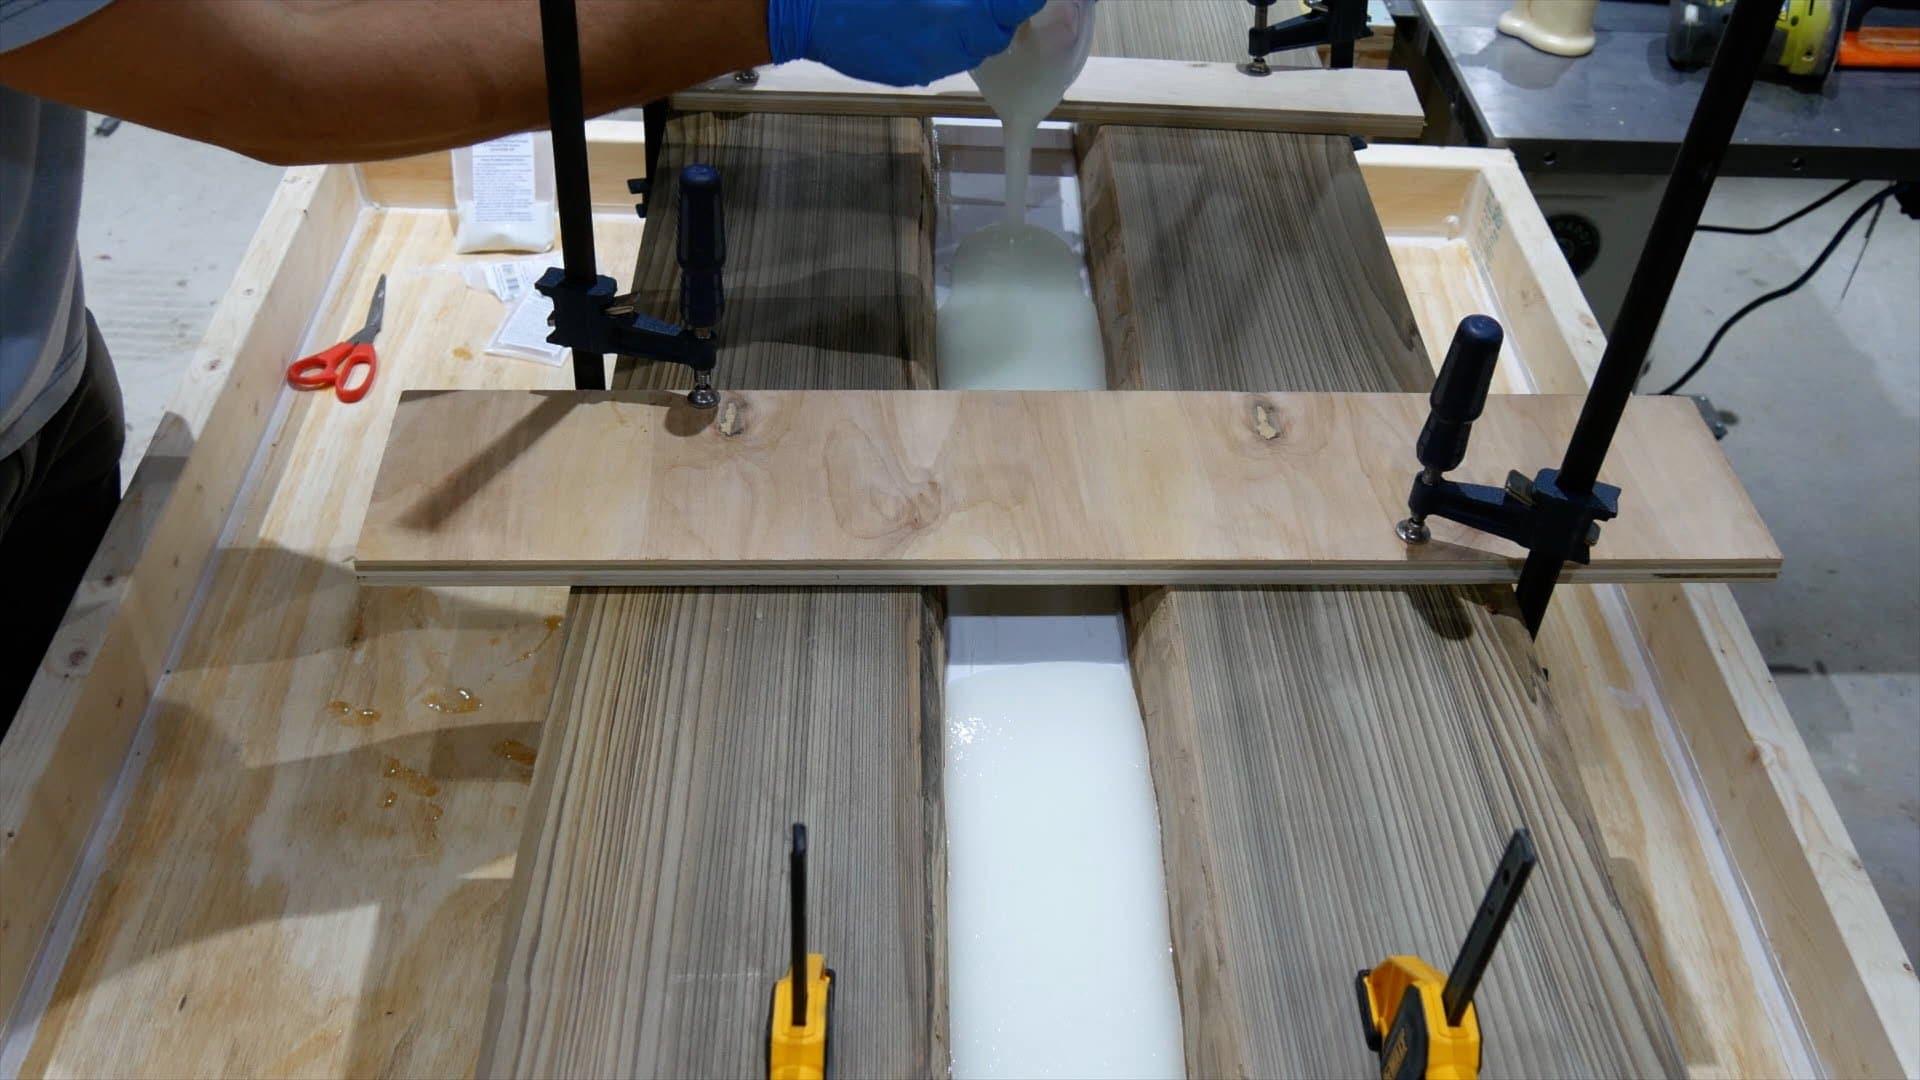 epoxy-resin-river-table-glowpowder_20171016_24